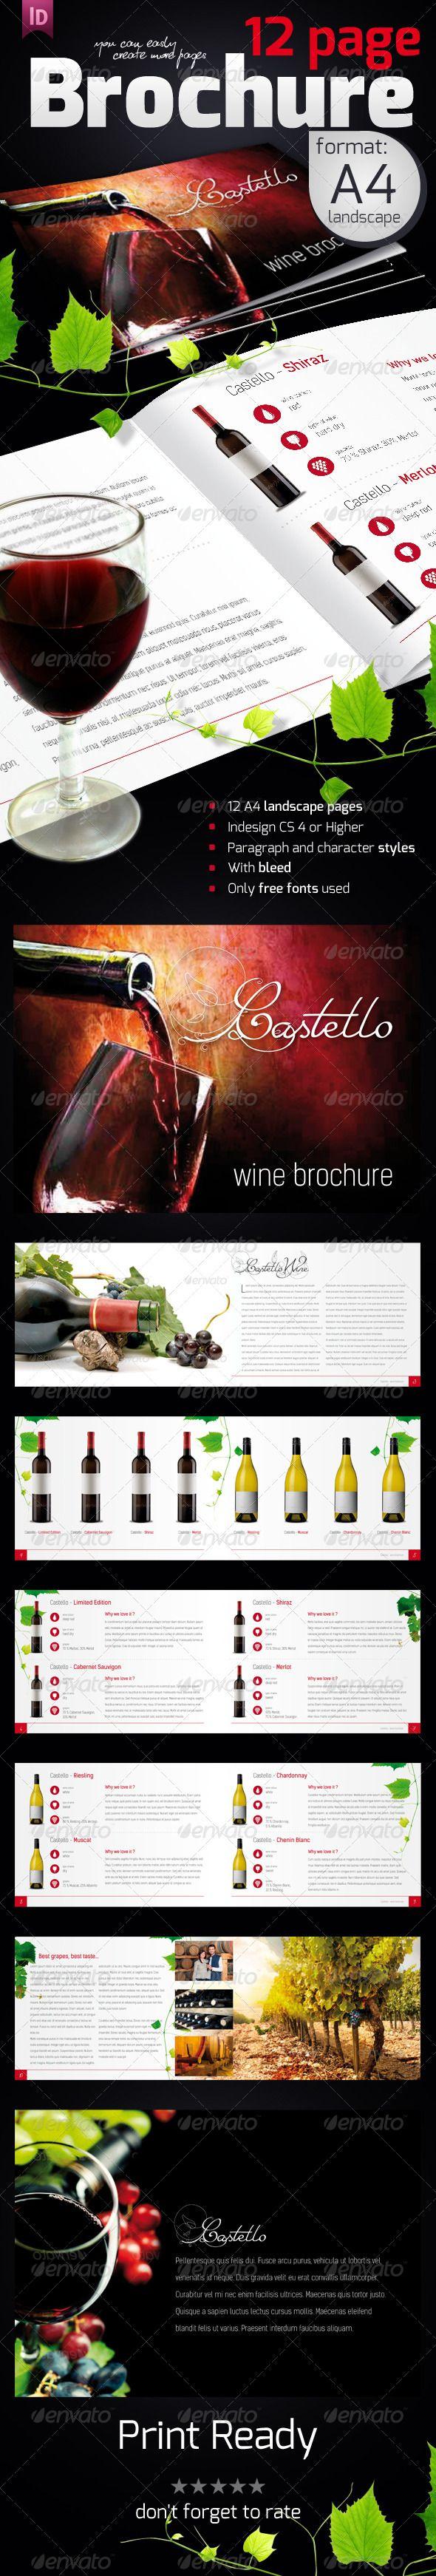 Wine Brochure Brochures Print Templates Catalog Print Templates